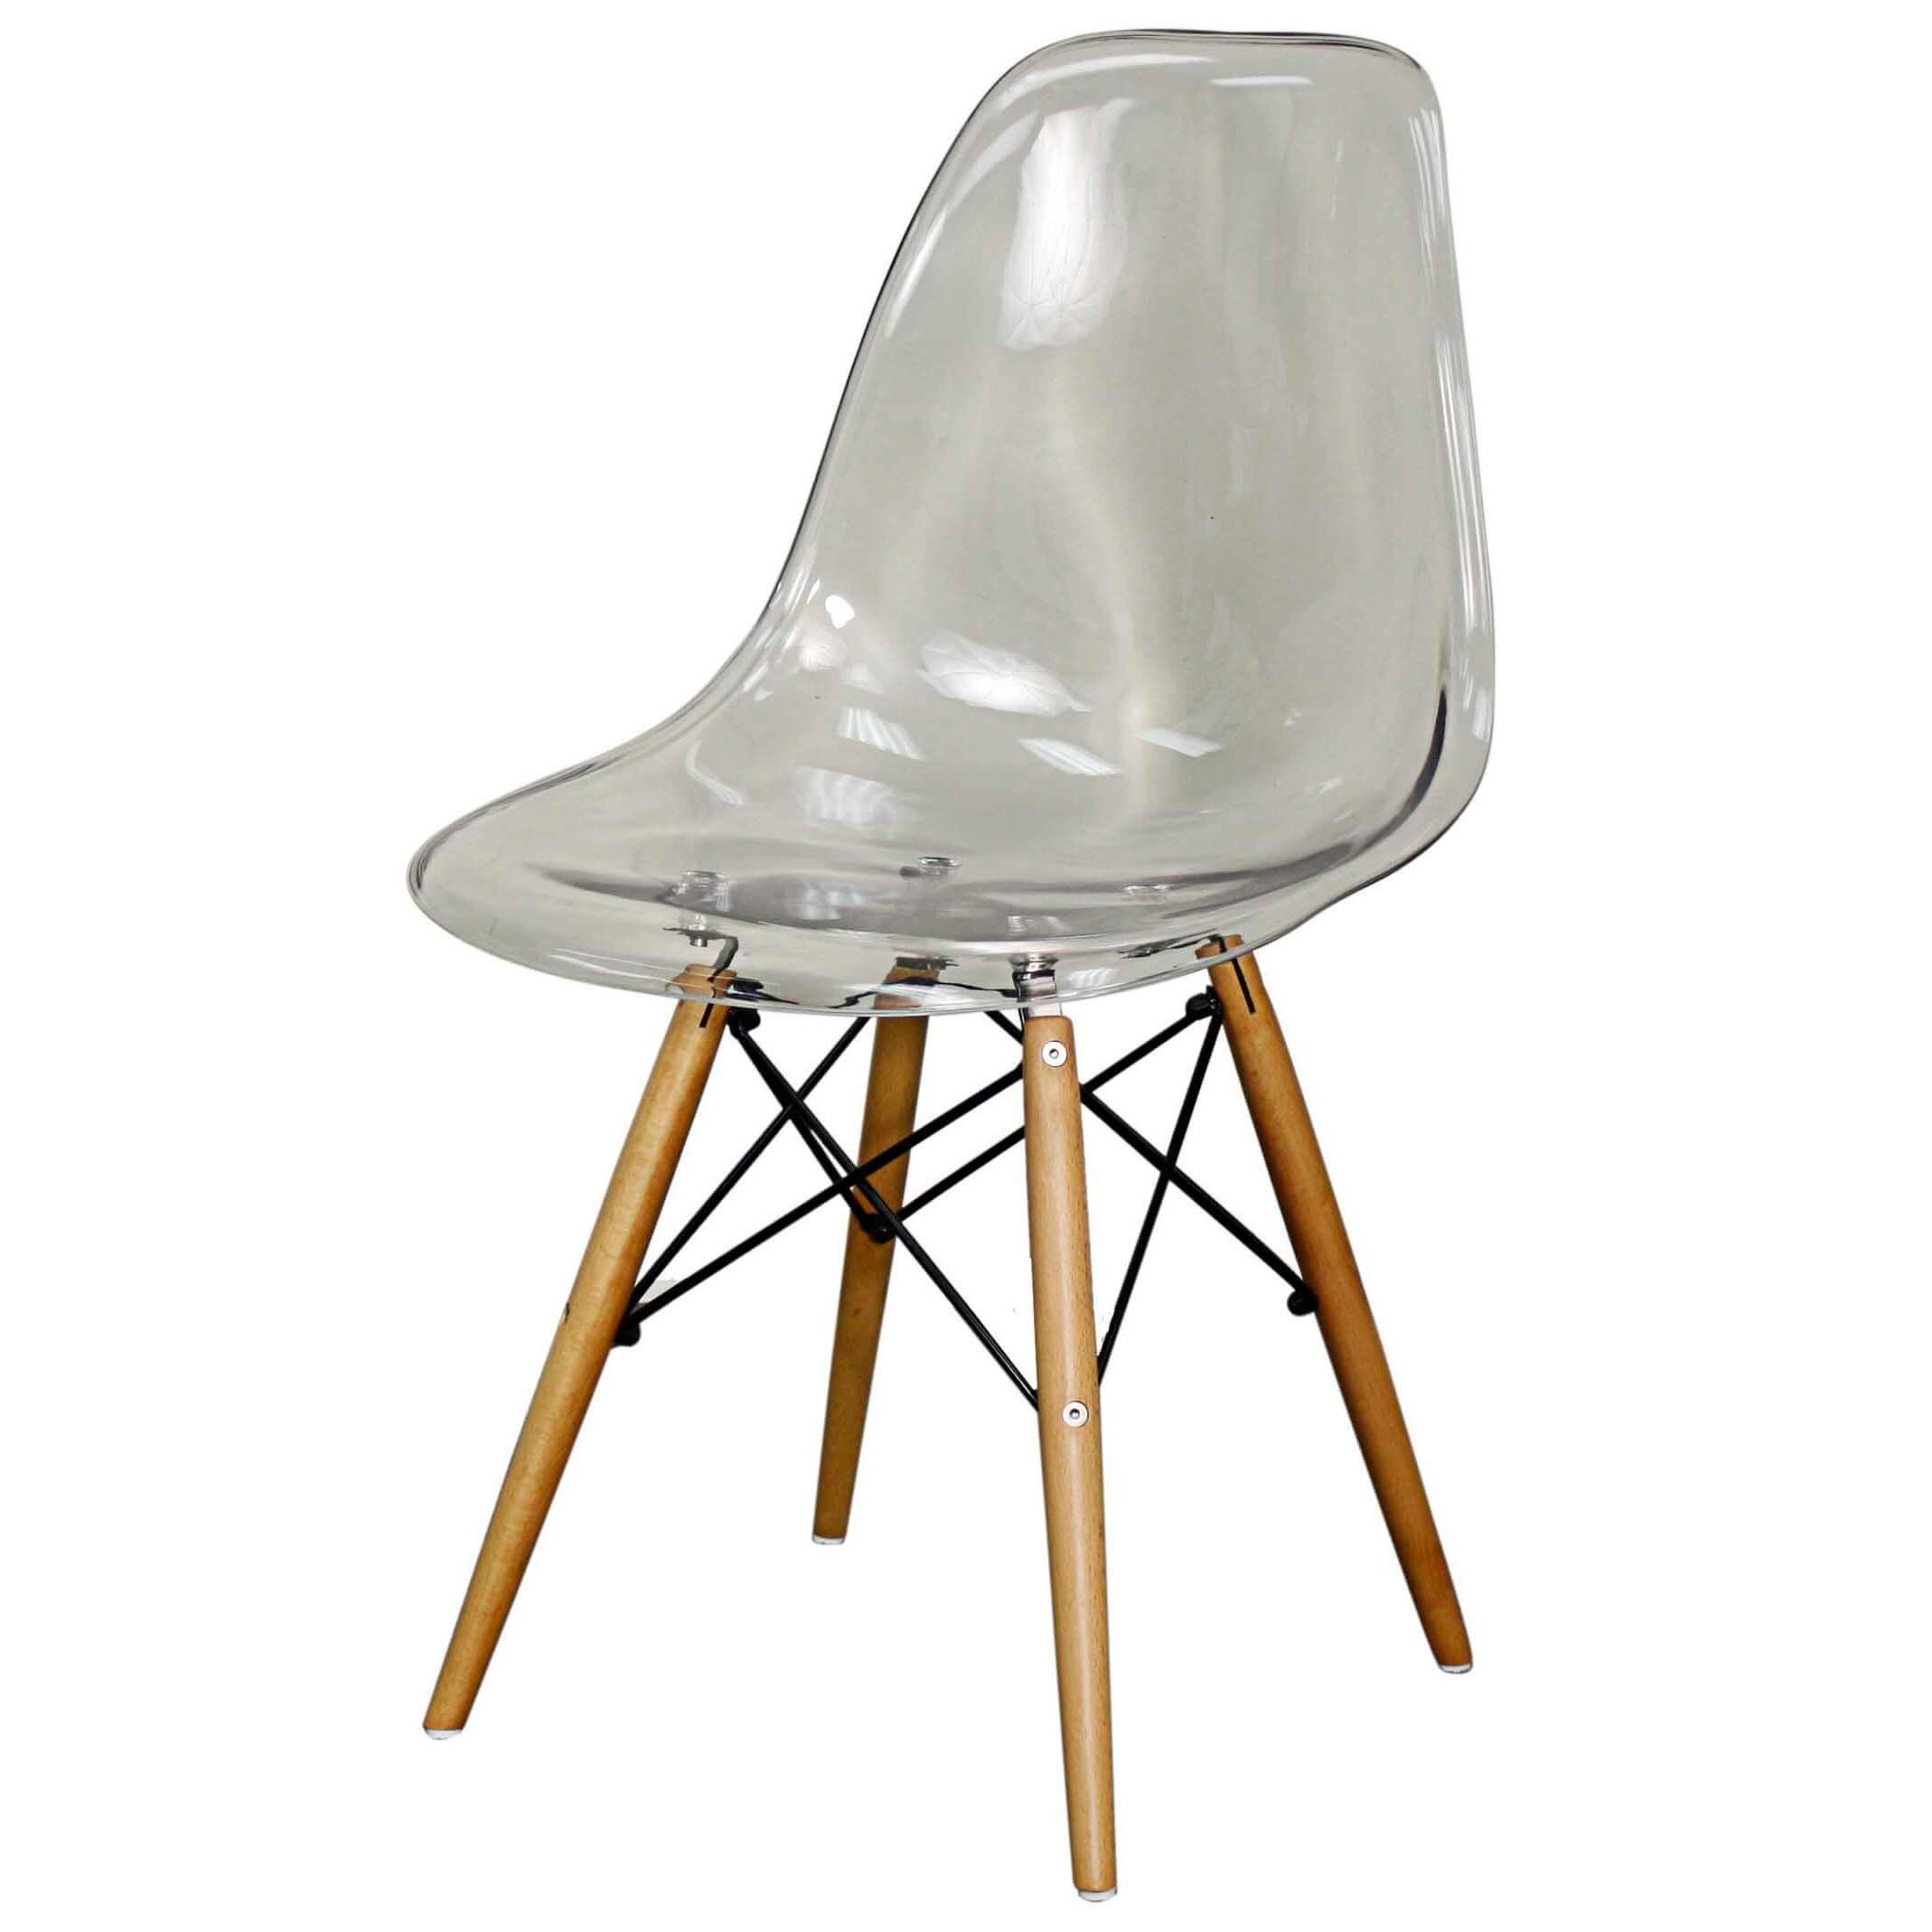 Allen Molded PC Chair Maple Dowel Legs Transparent Crystal Set